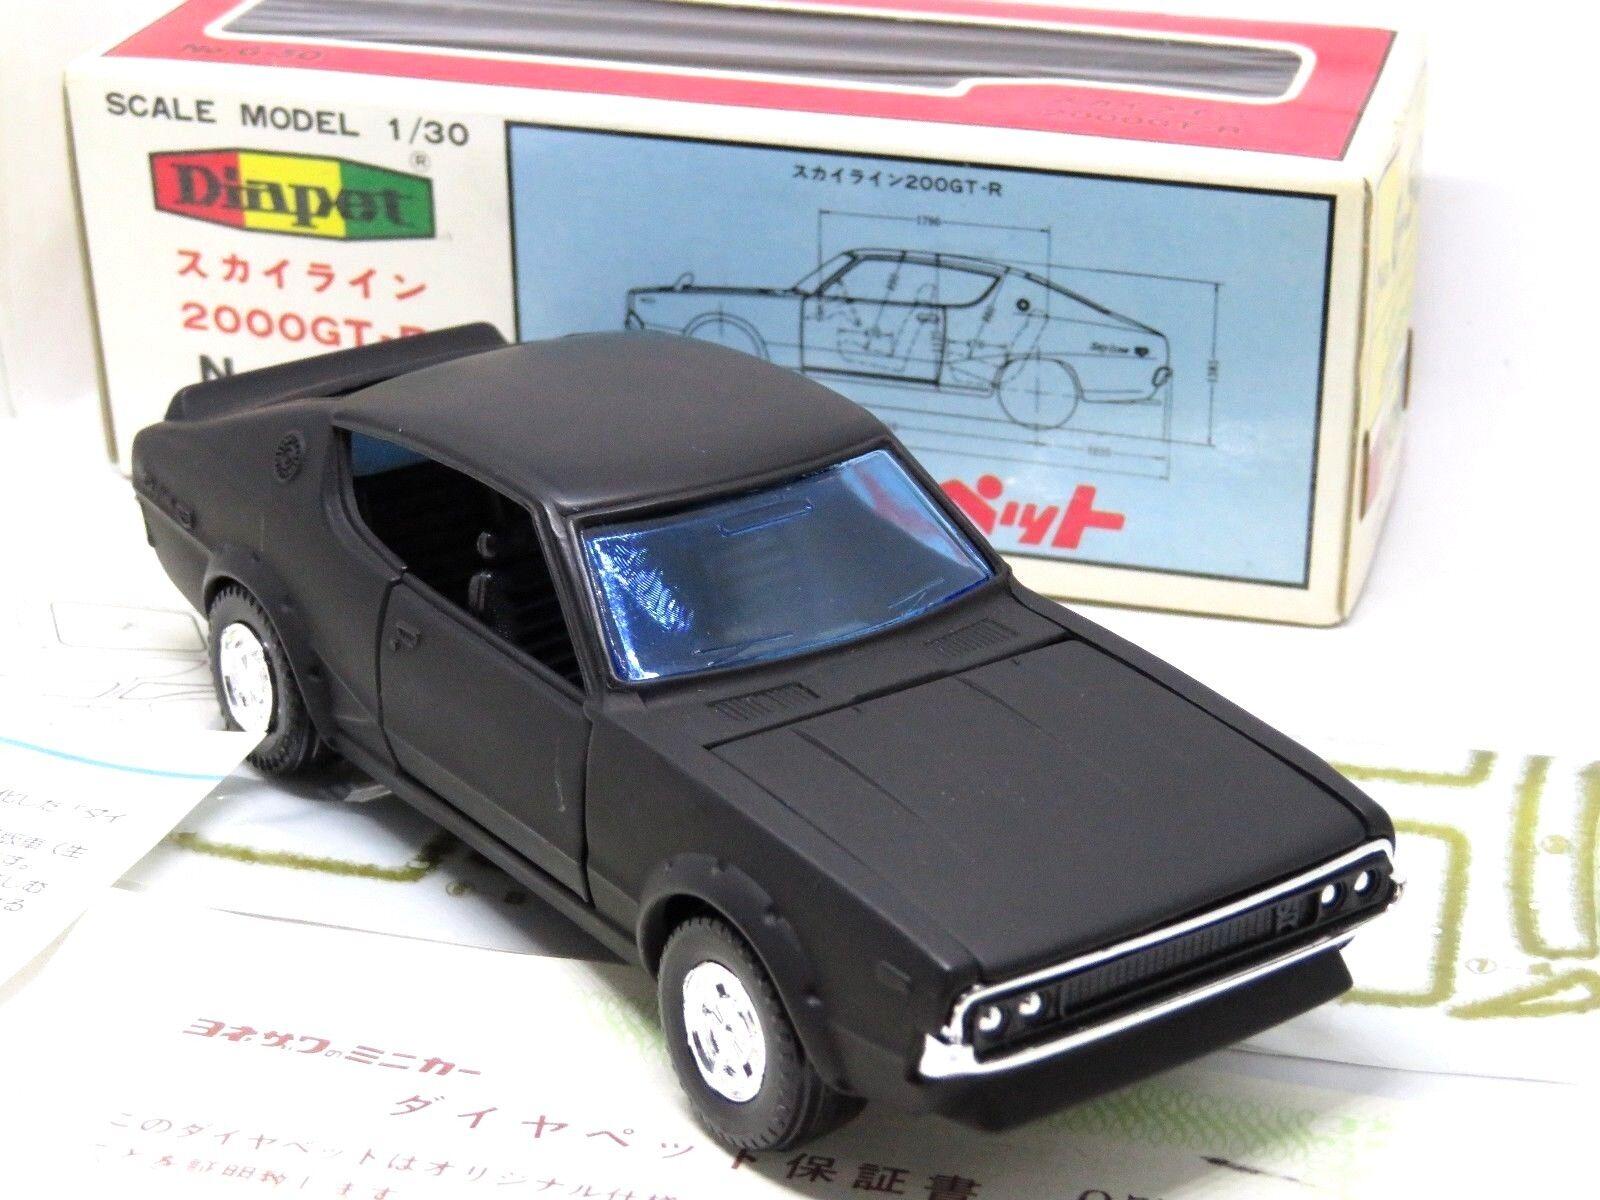 compras en linea Yonezawa DIAPET Nissan 2000GT-R All All All negro, G50 modelo muy raro, Caja papeleo.  lo último